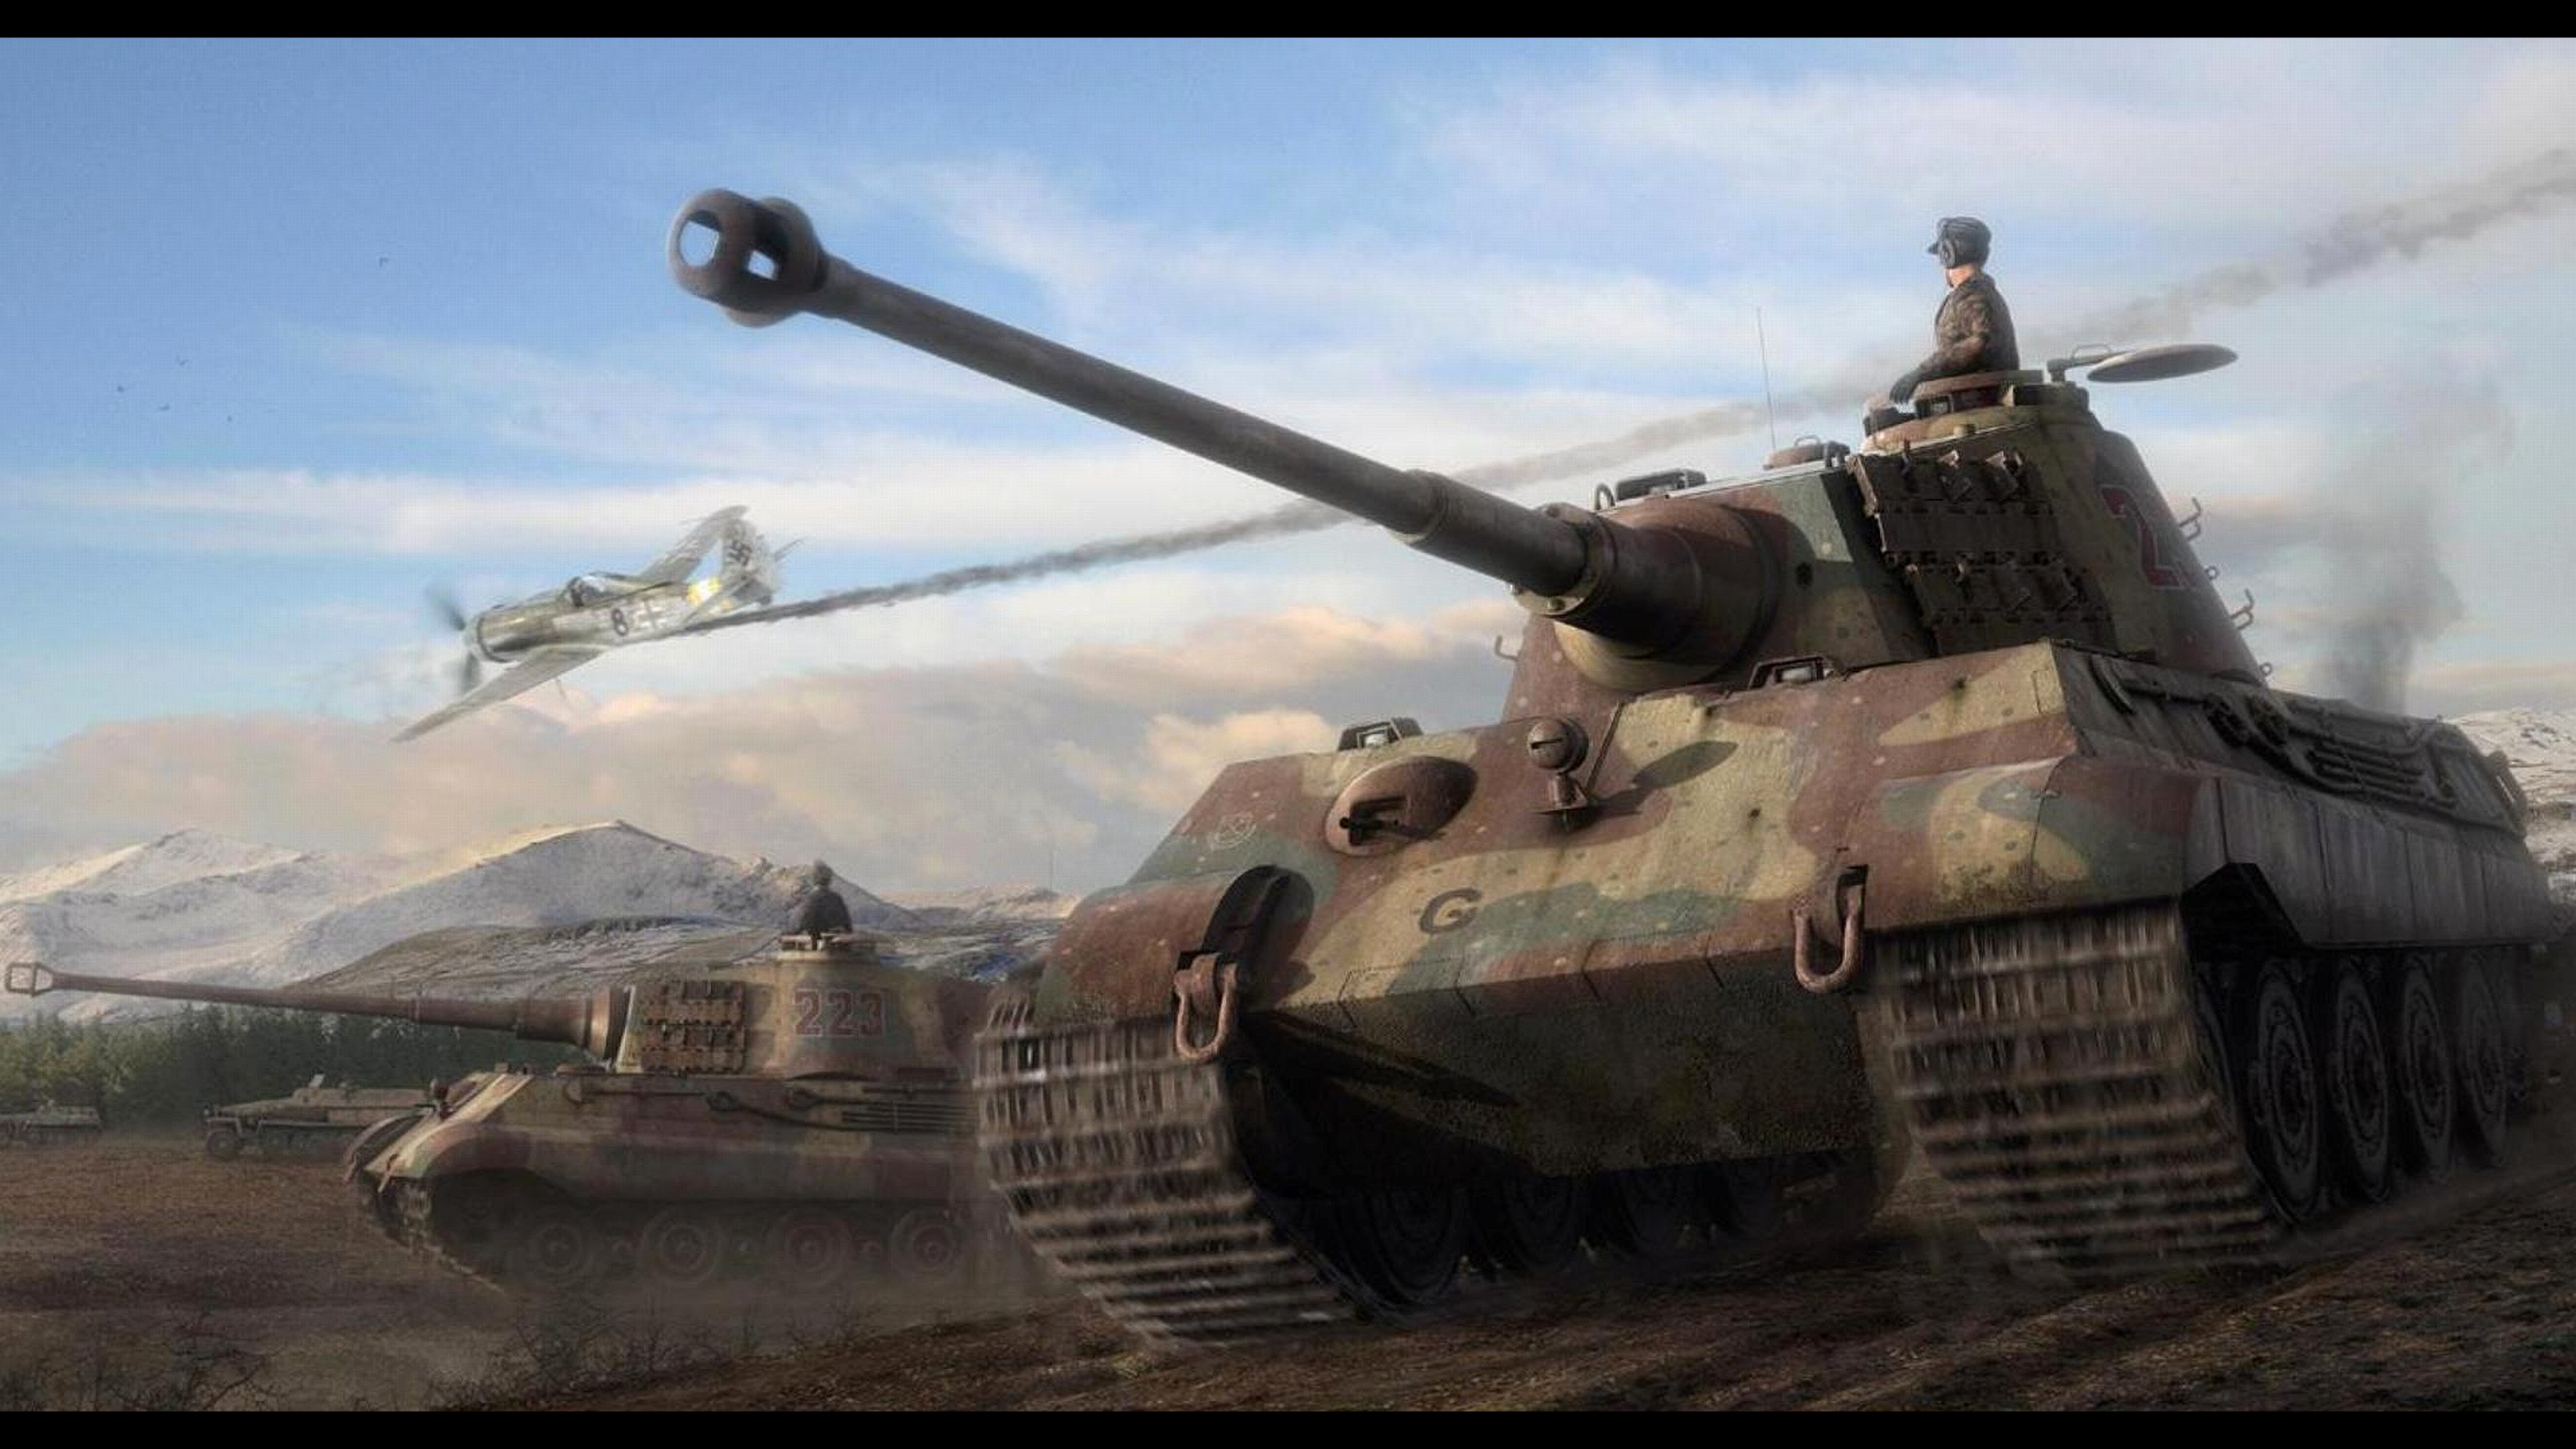 Res: 3840x2160, Tank Wallpaper New World War 2 Tanks Wallpapers Impremedia